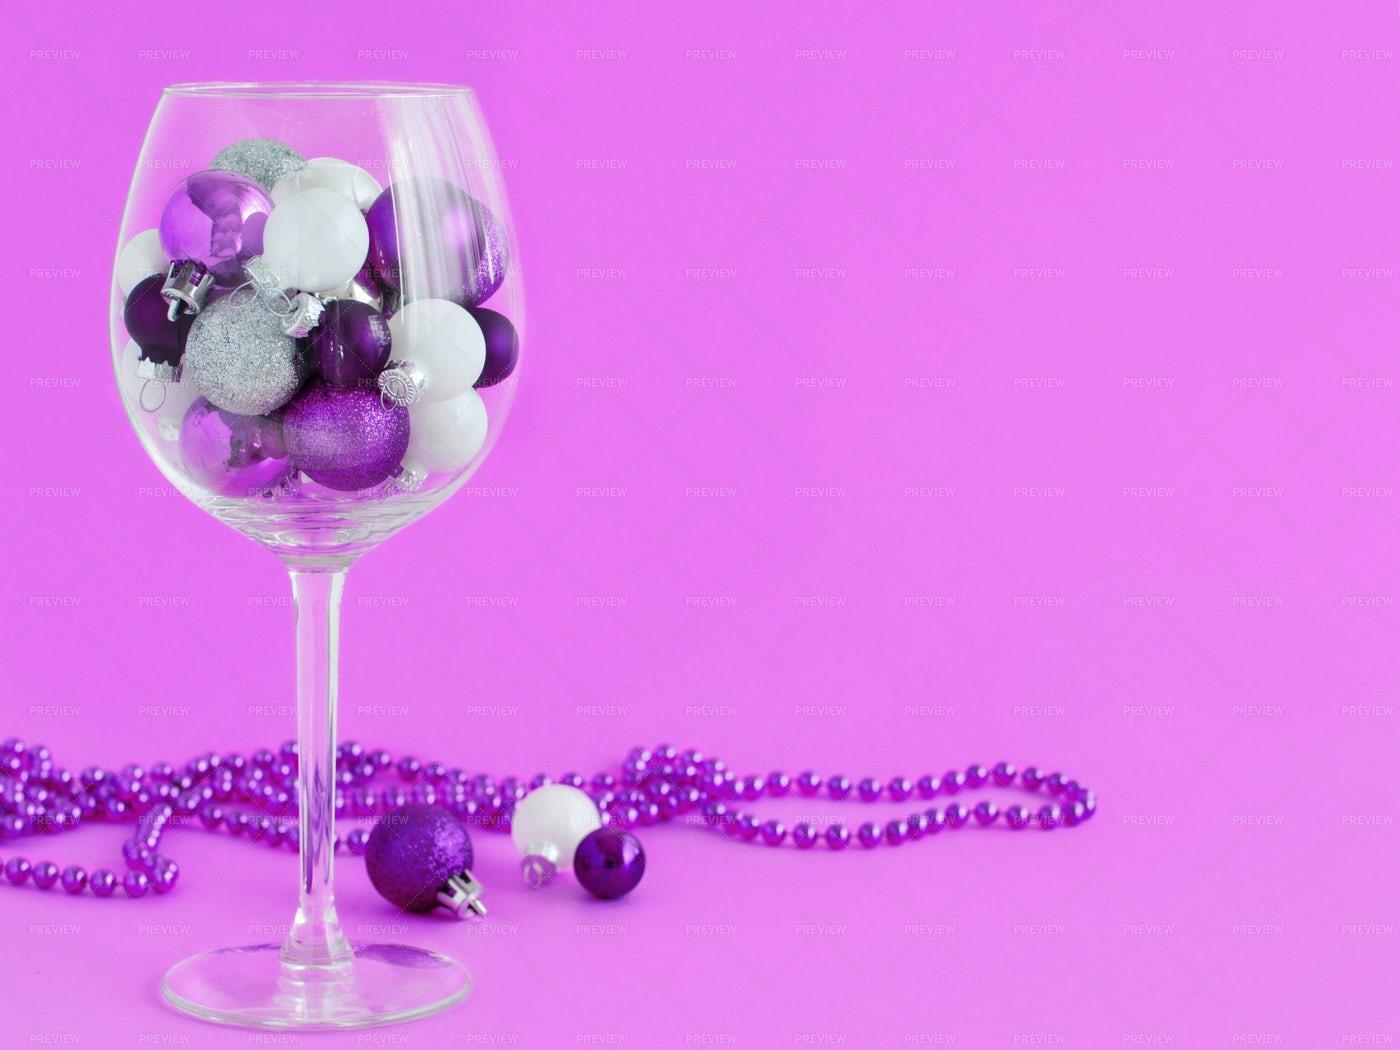 Christmas Baubles On Purple: Stock Photos